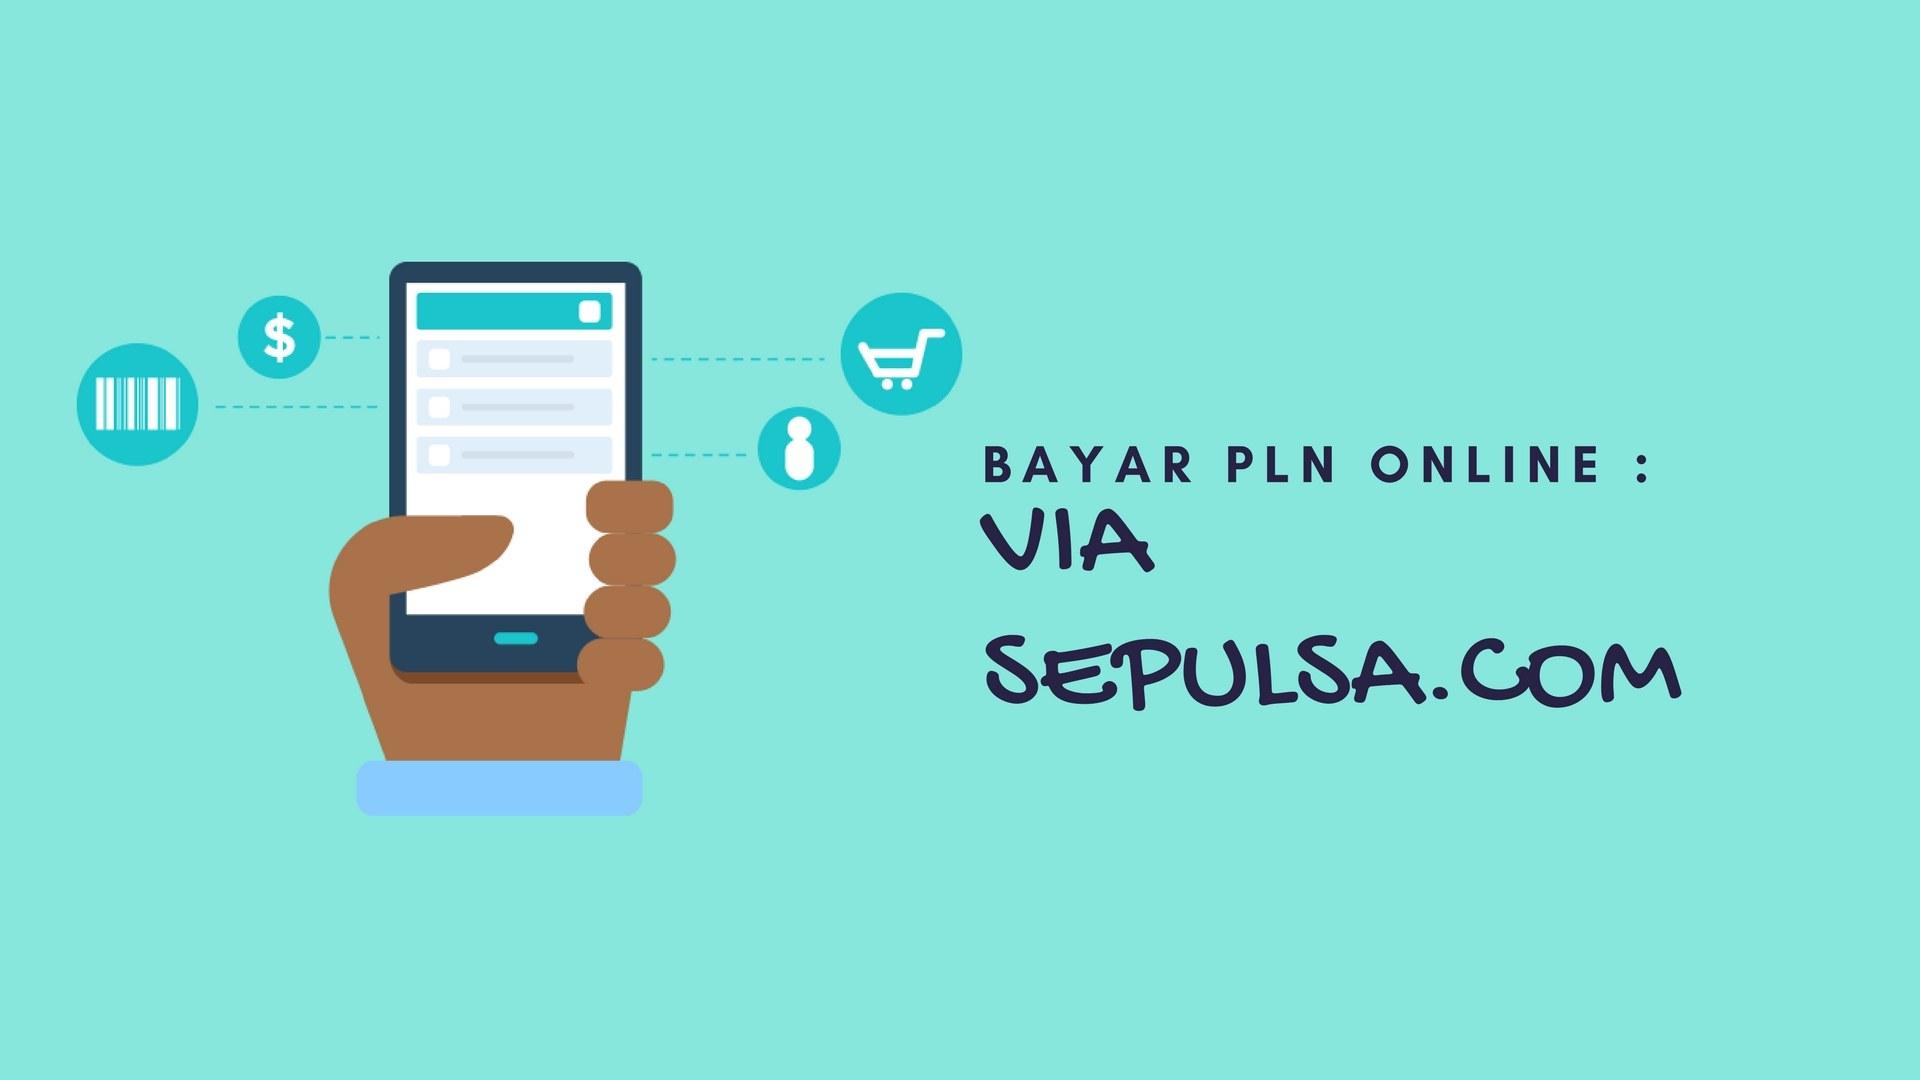 Bayar PLN Online : Via Sepulsa.com